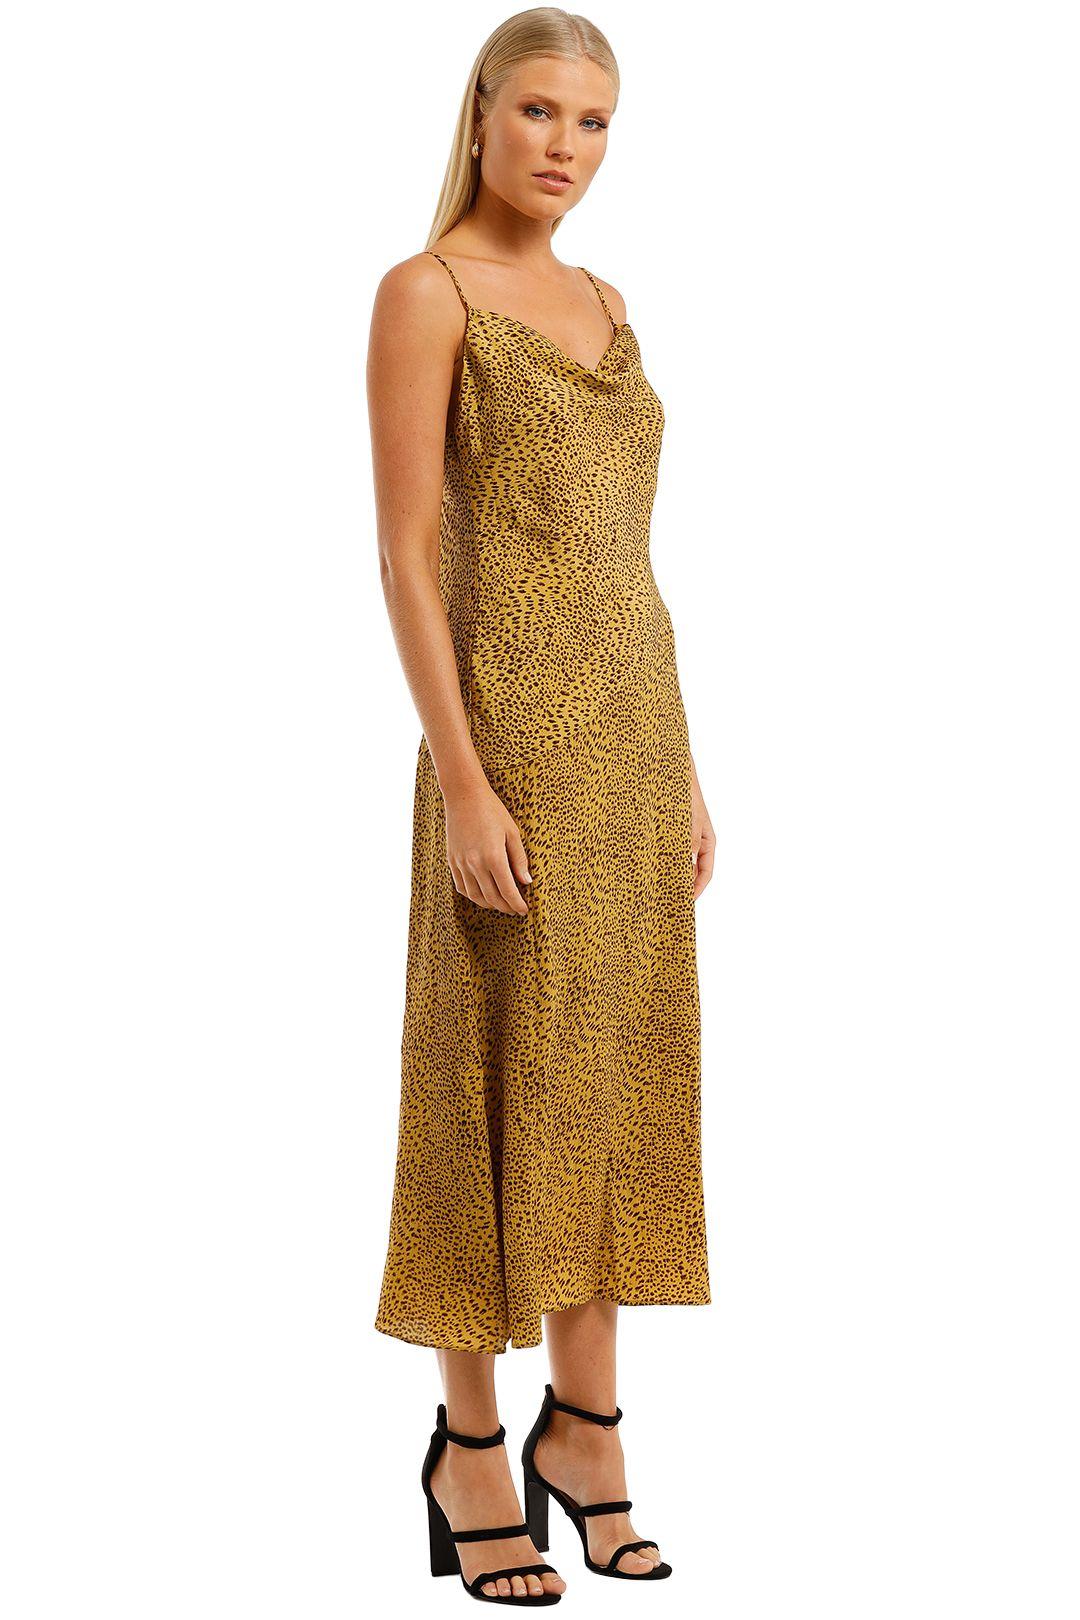 Elliatt-Tudor-Dress-Multi-Side